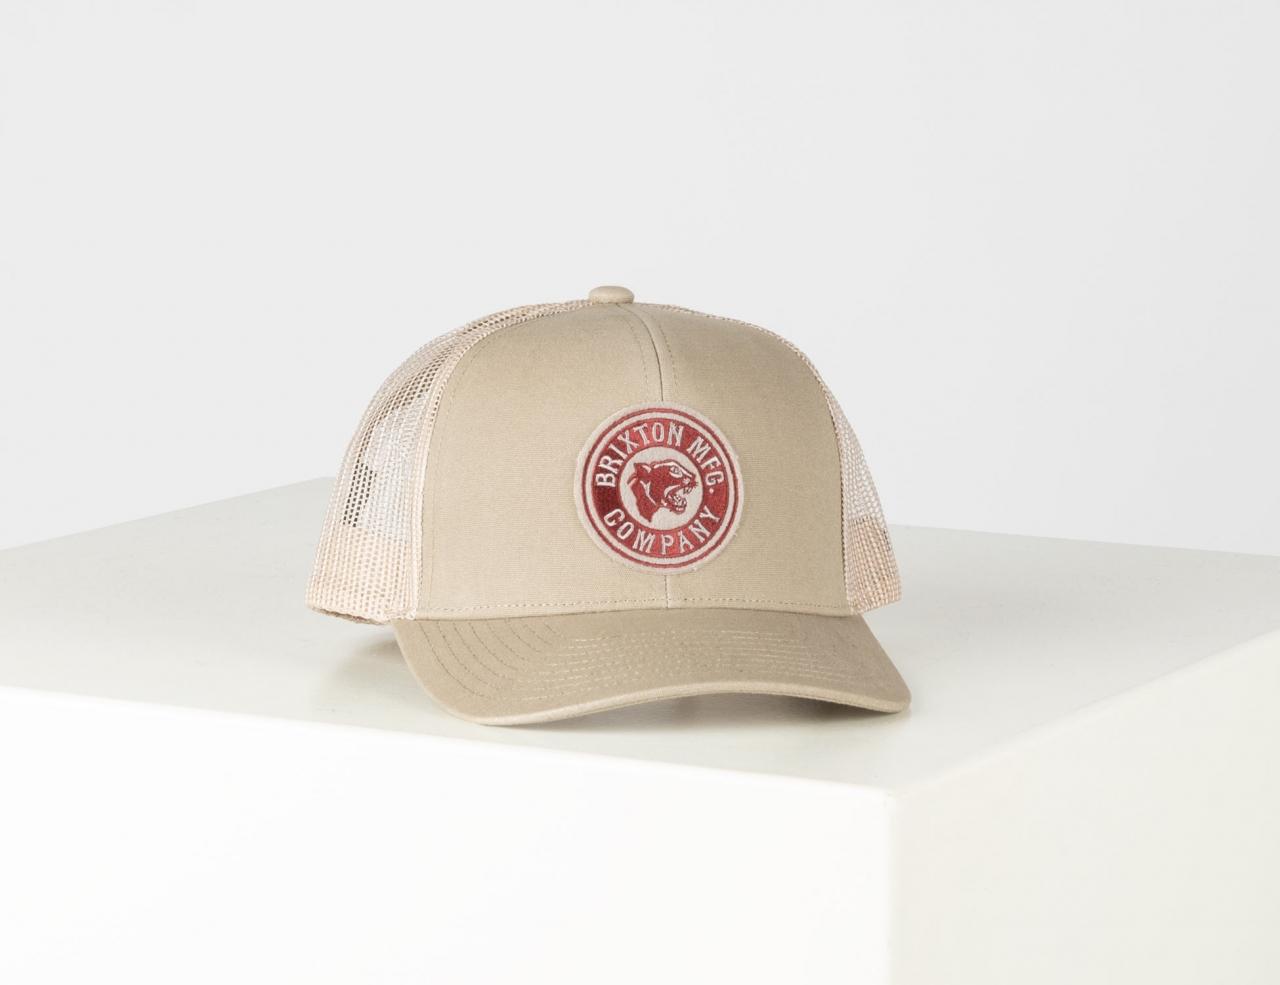 Brixton Forte Mp Mesh Cap - Khaki / Brick